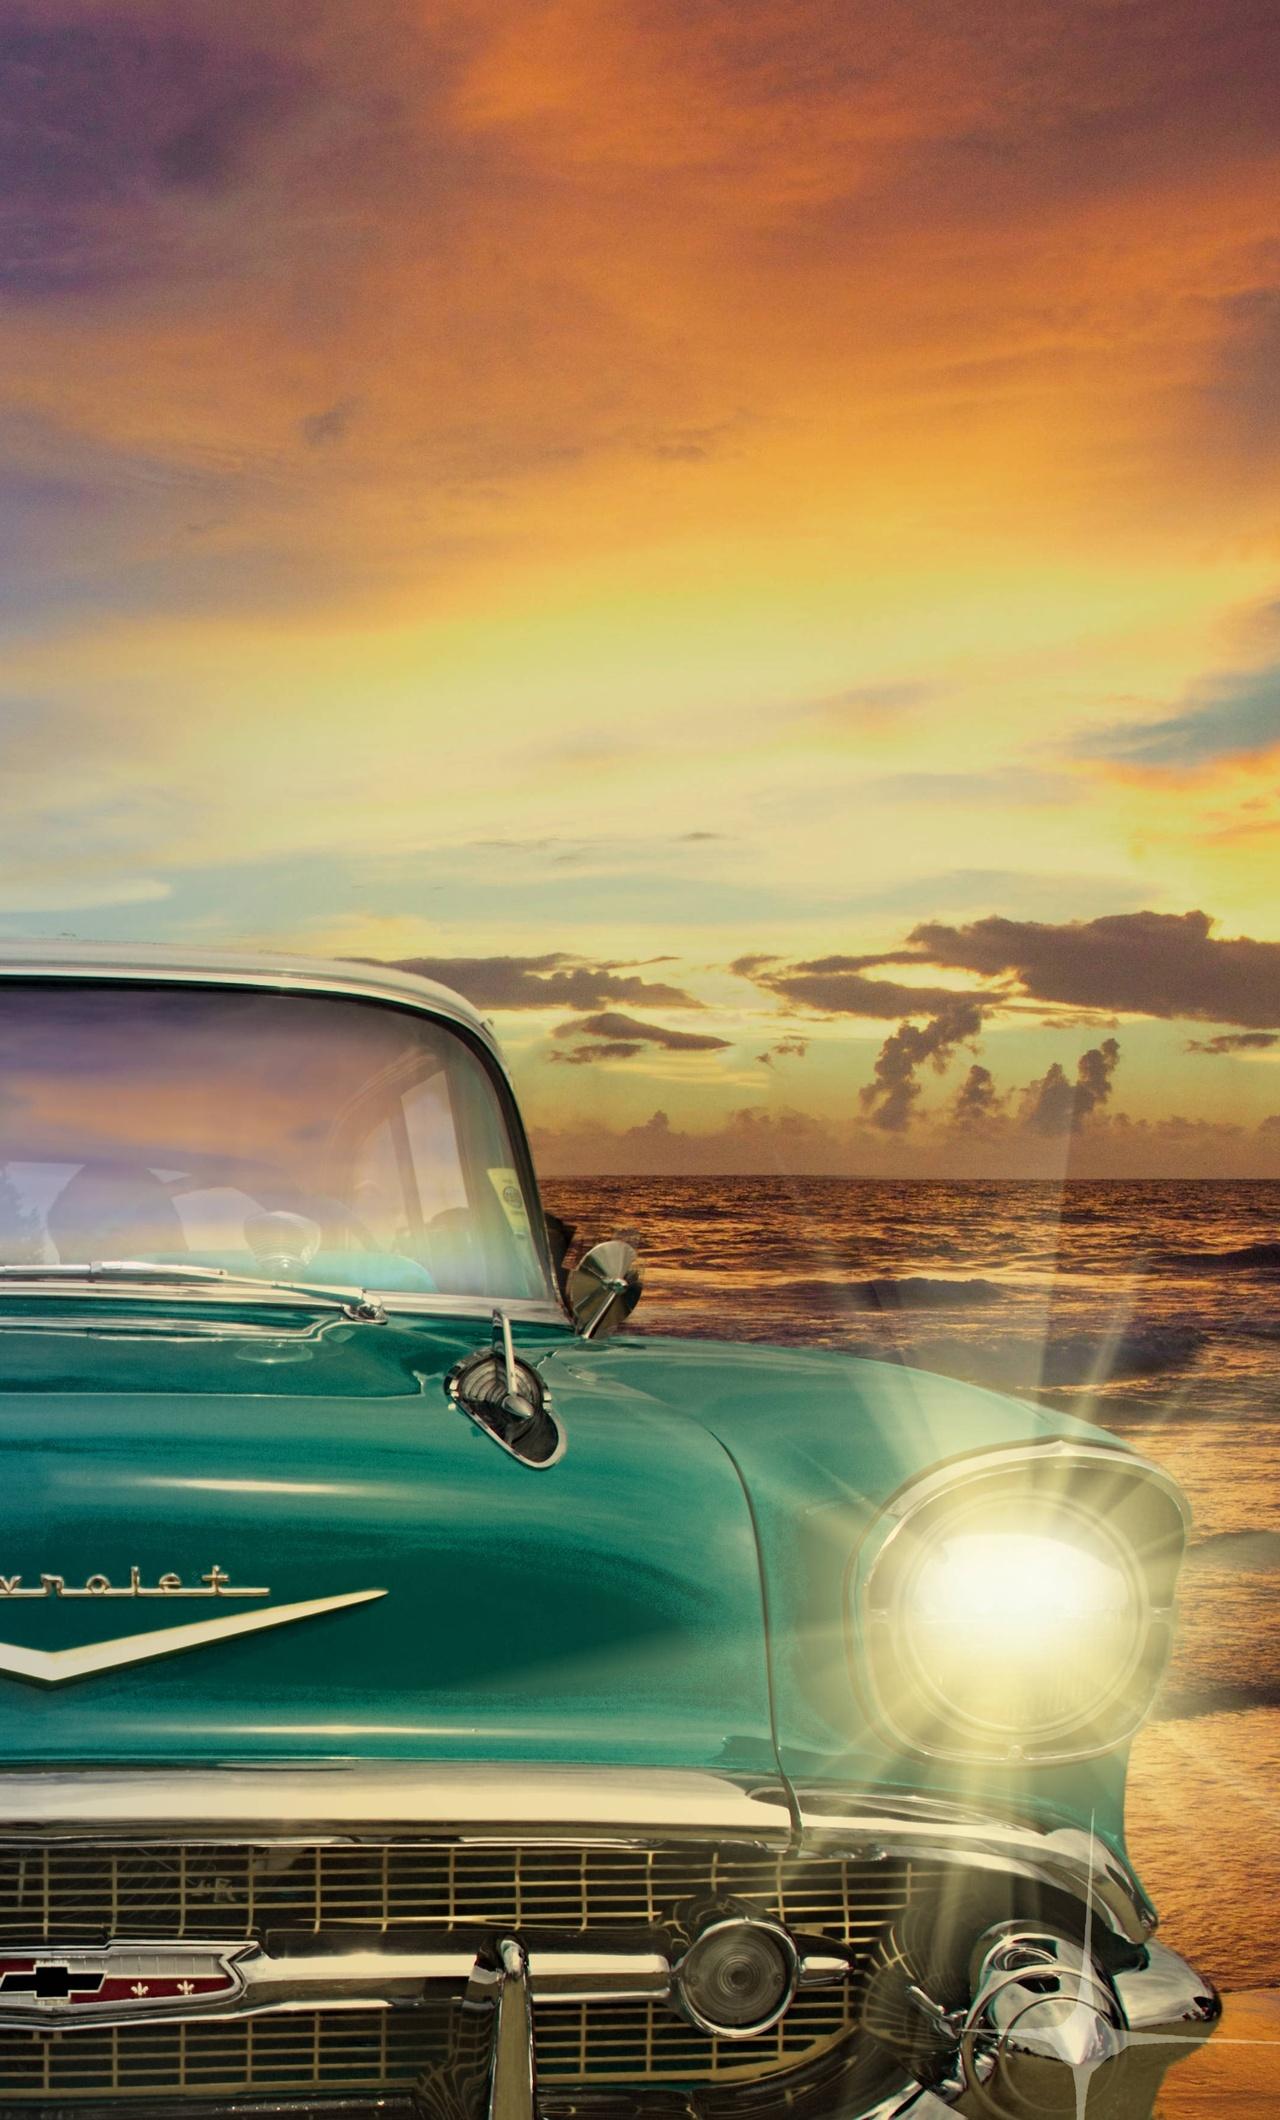 Chevrolet Old Retro Classic Vintage Car Hk